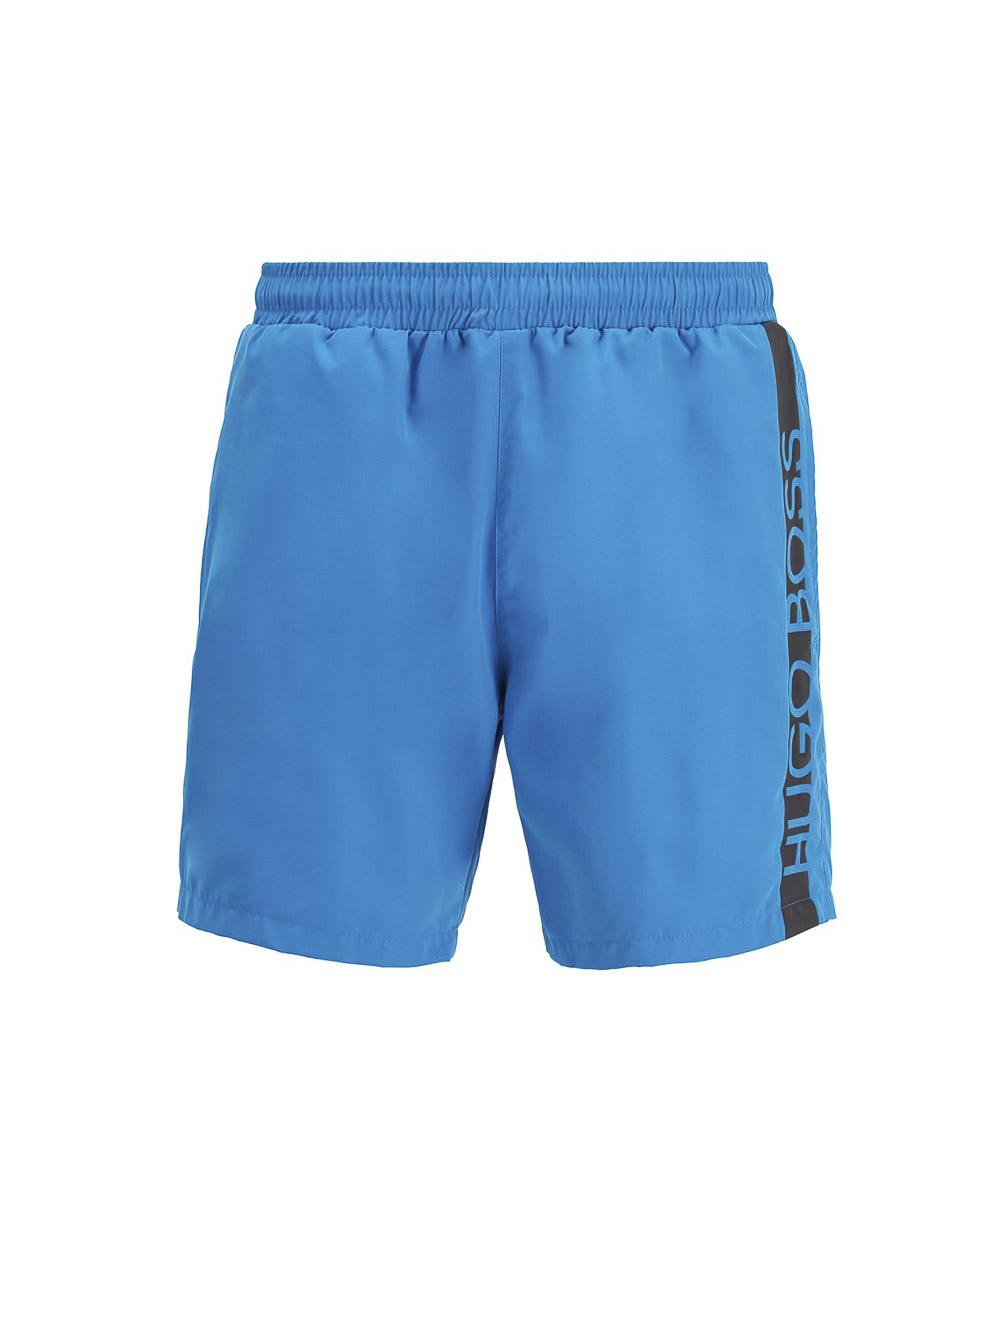 BOSS Μαγιό shorts 50407595-424 ΗΛΕΚΤΡΙΚ